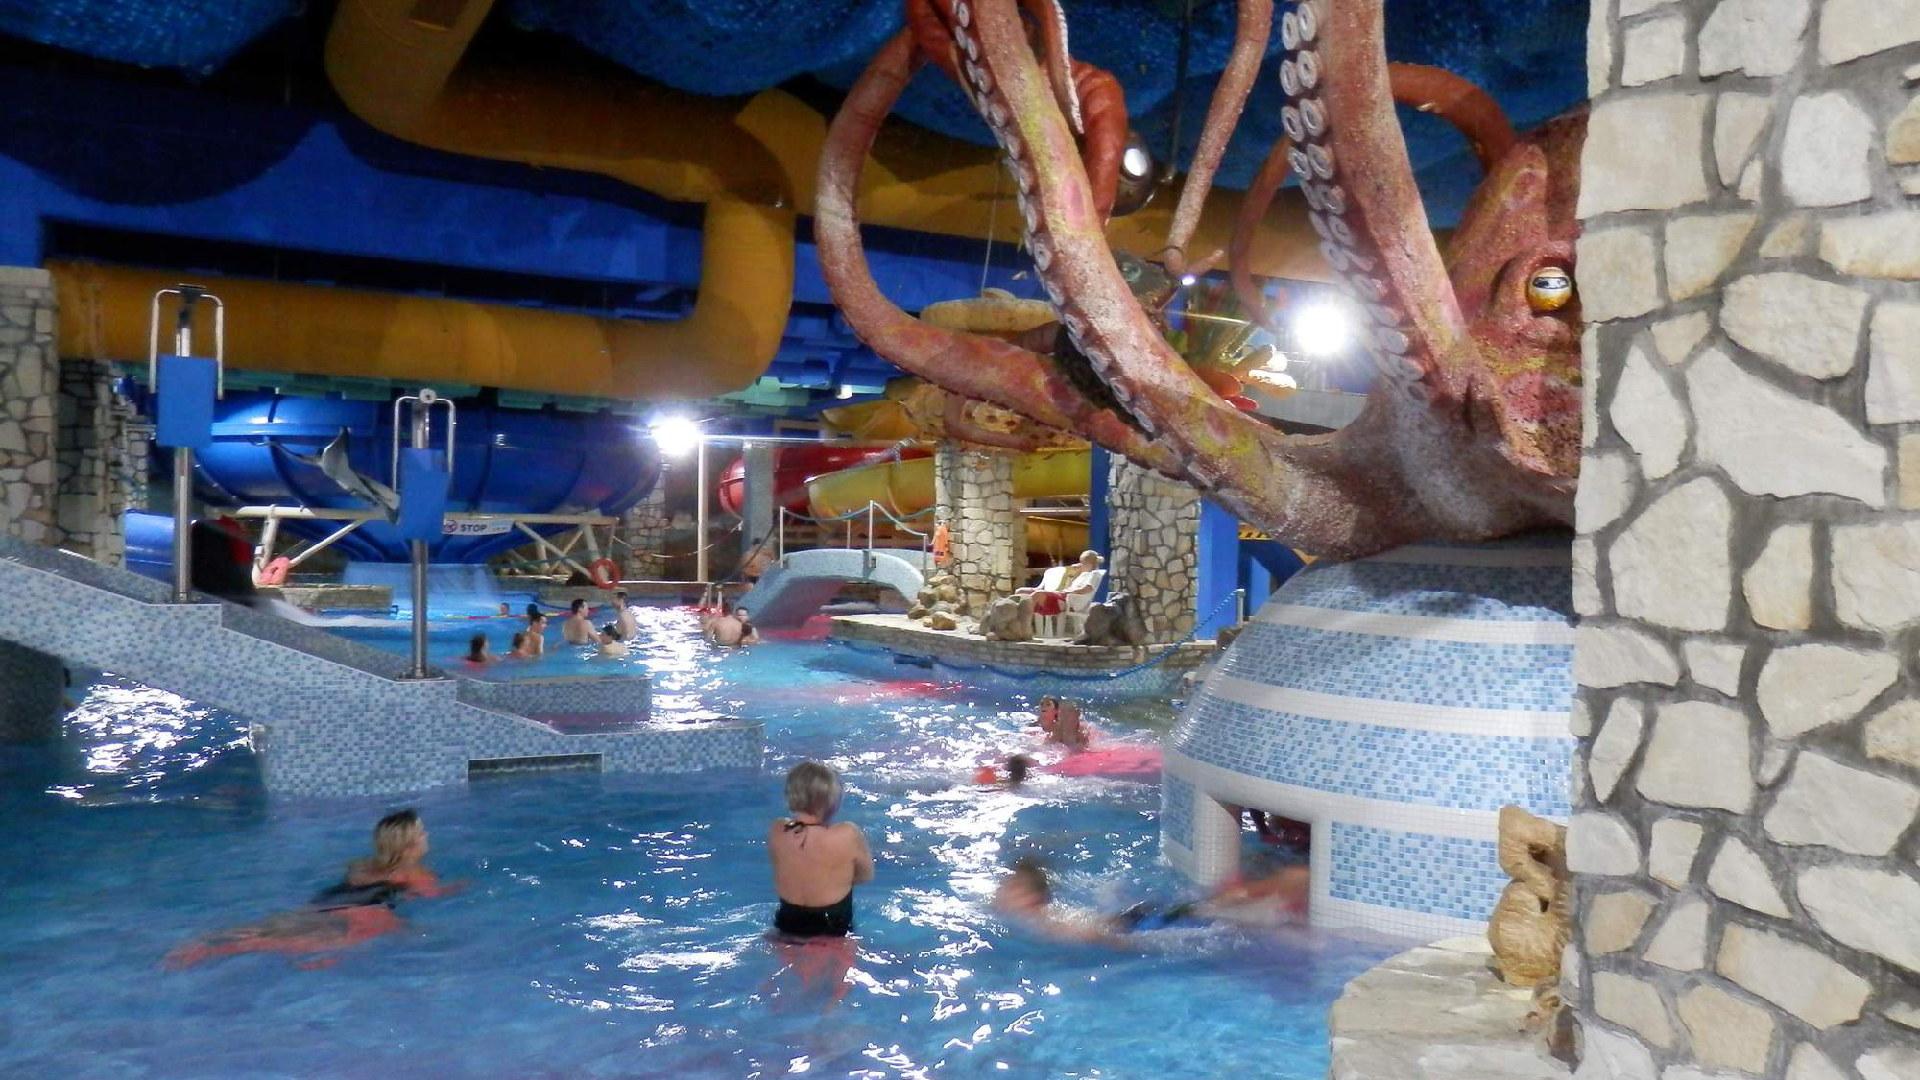 Aquapark Babylon v Liberci - Průvodce s tajnými tipy